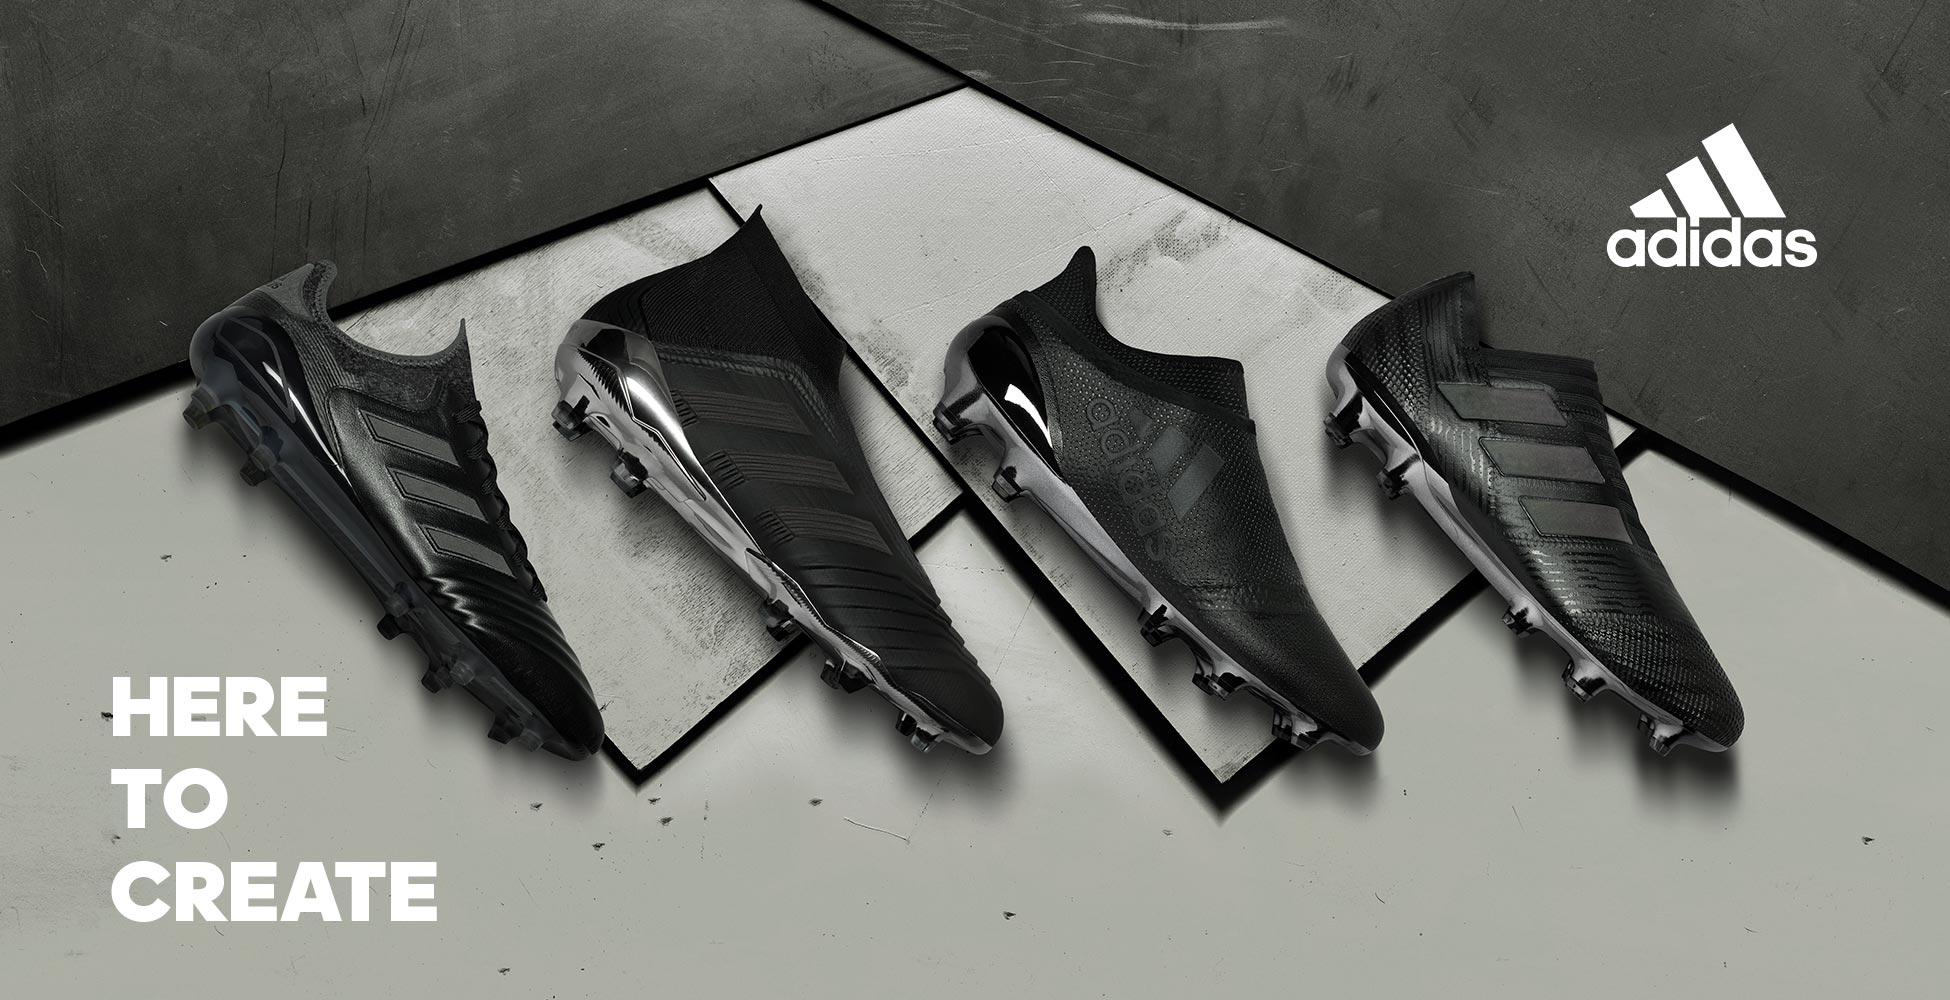 Kopačky Adidas Shadow Mode Pack